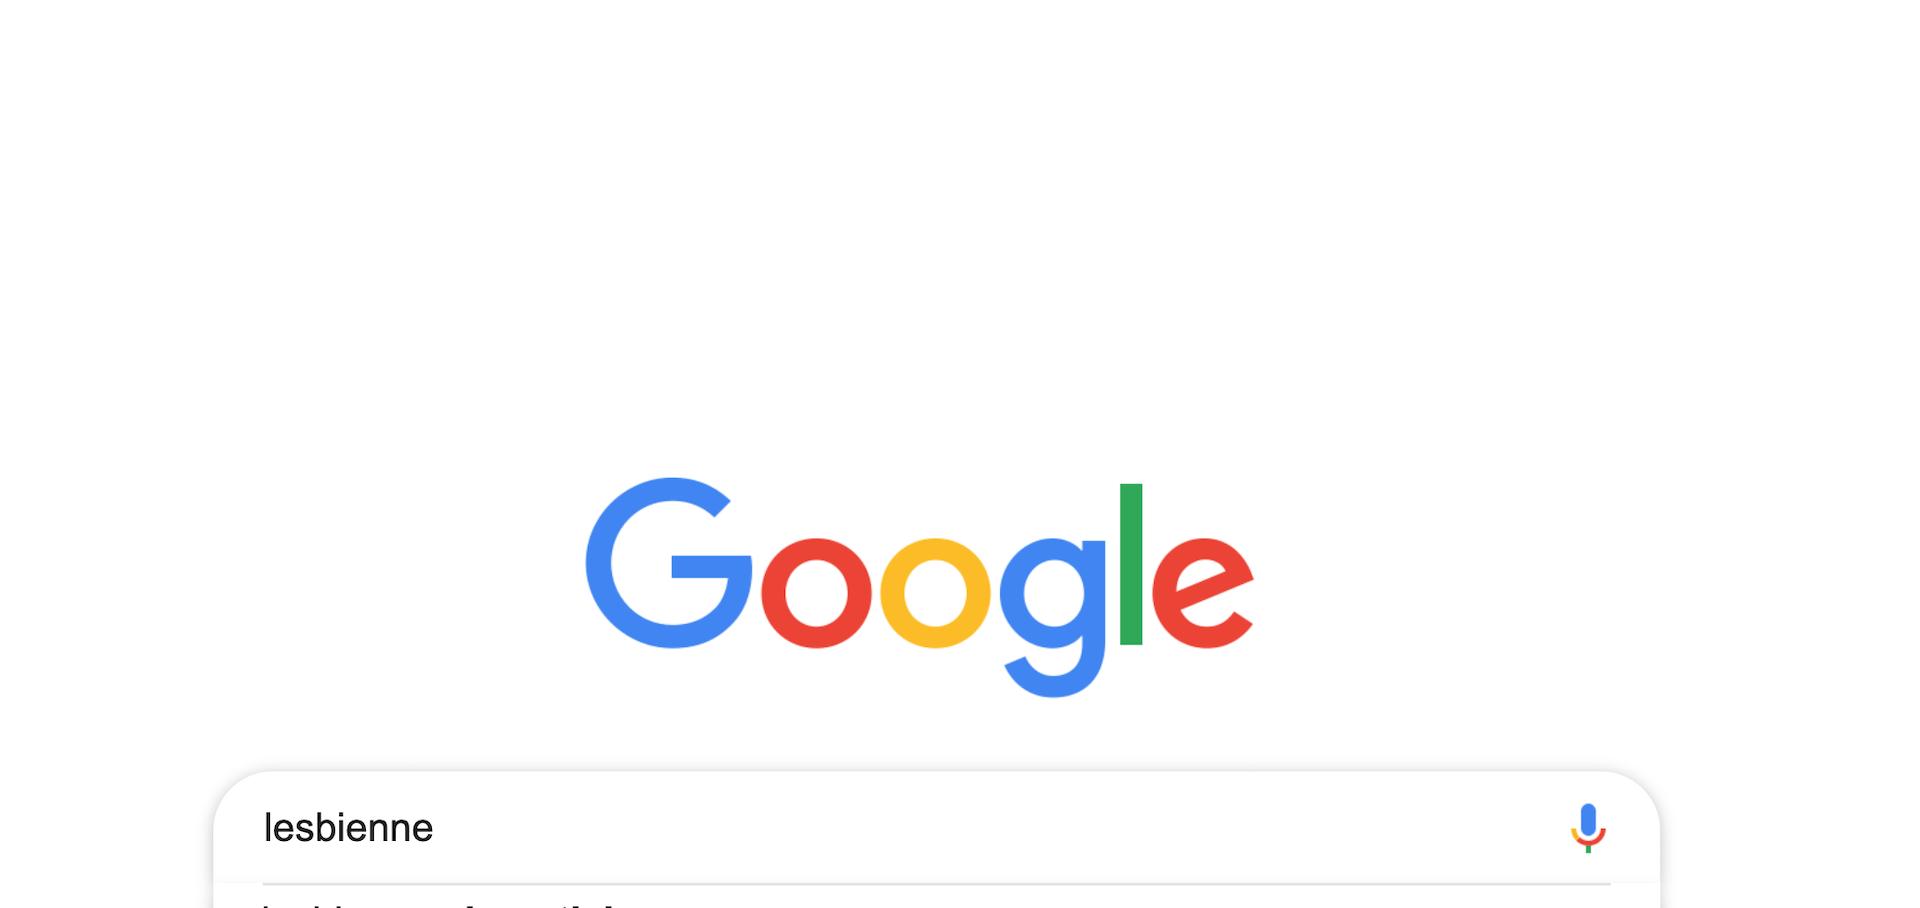 mot de passe porno recherche